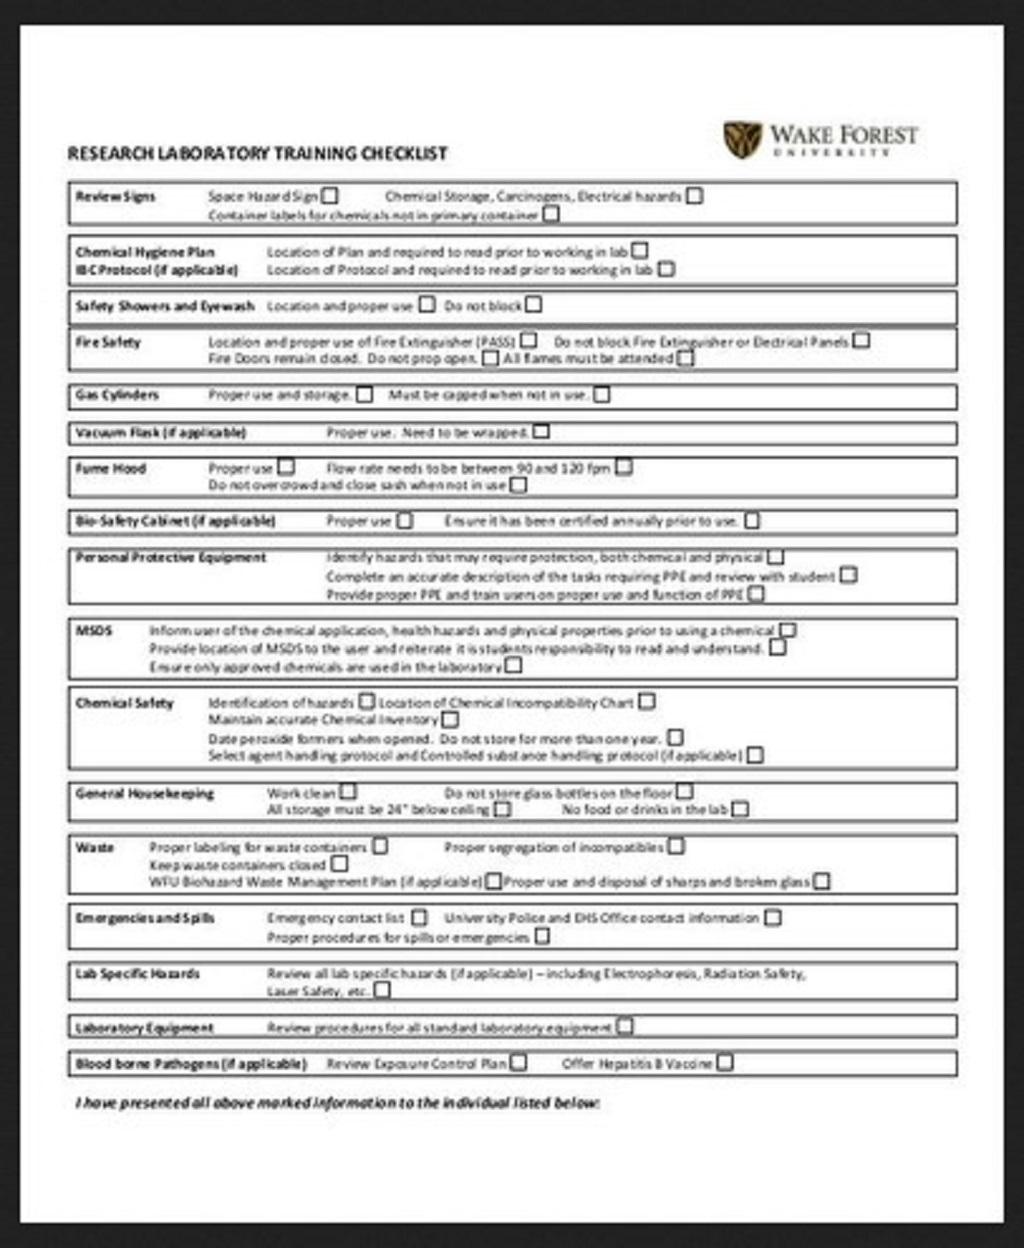 Laboratory Training Checklist Example Employee Word Pdf Template Google Docs  Samples Large